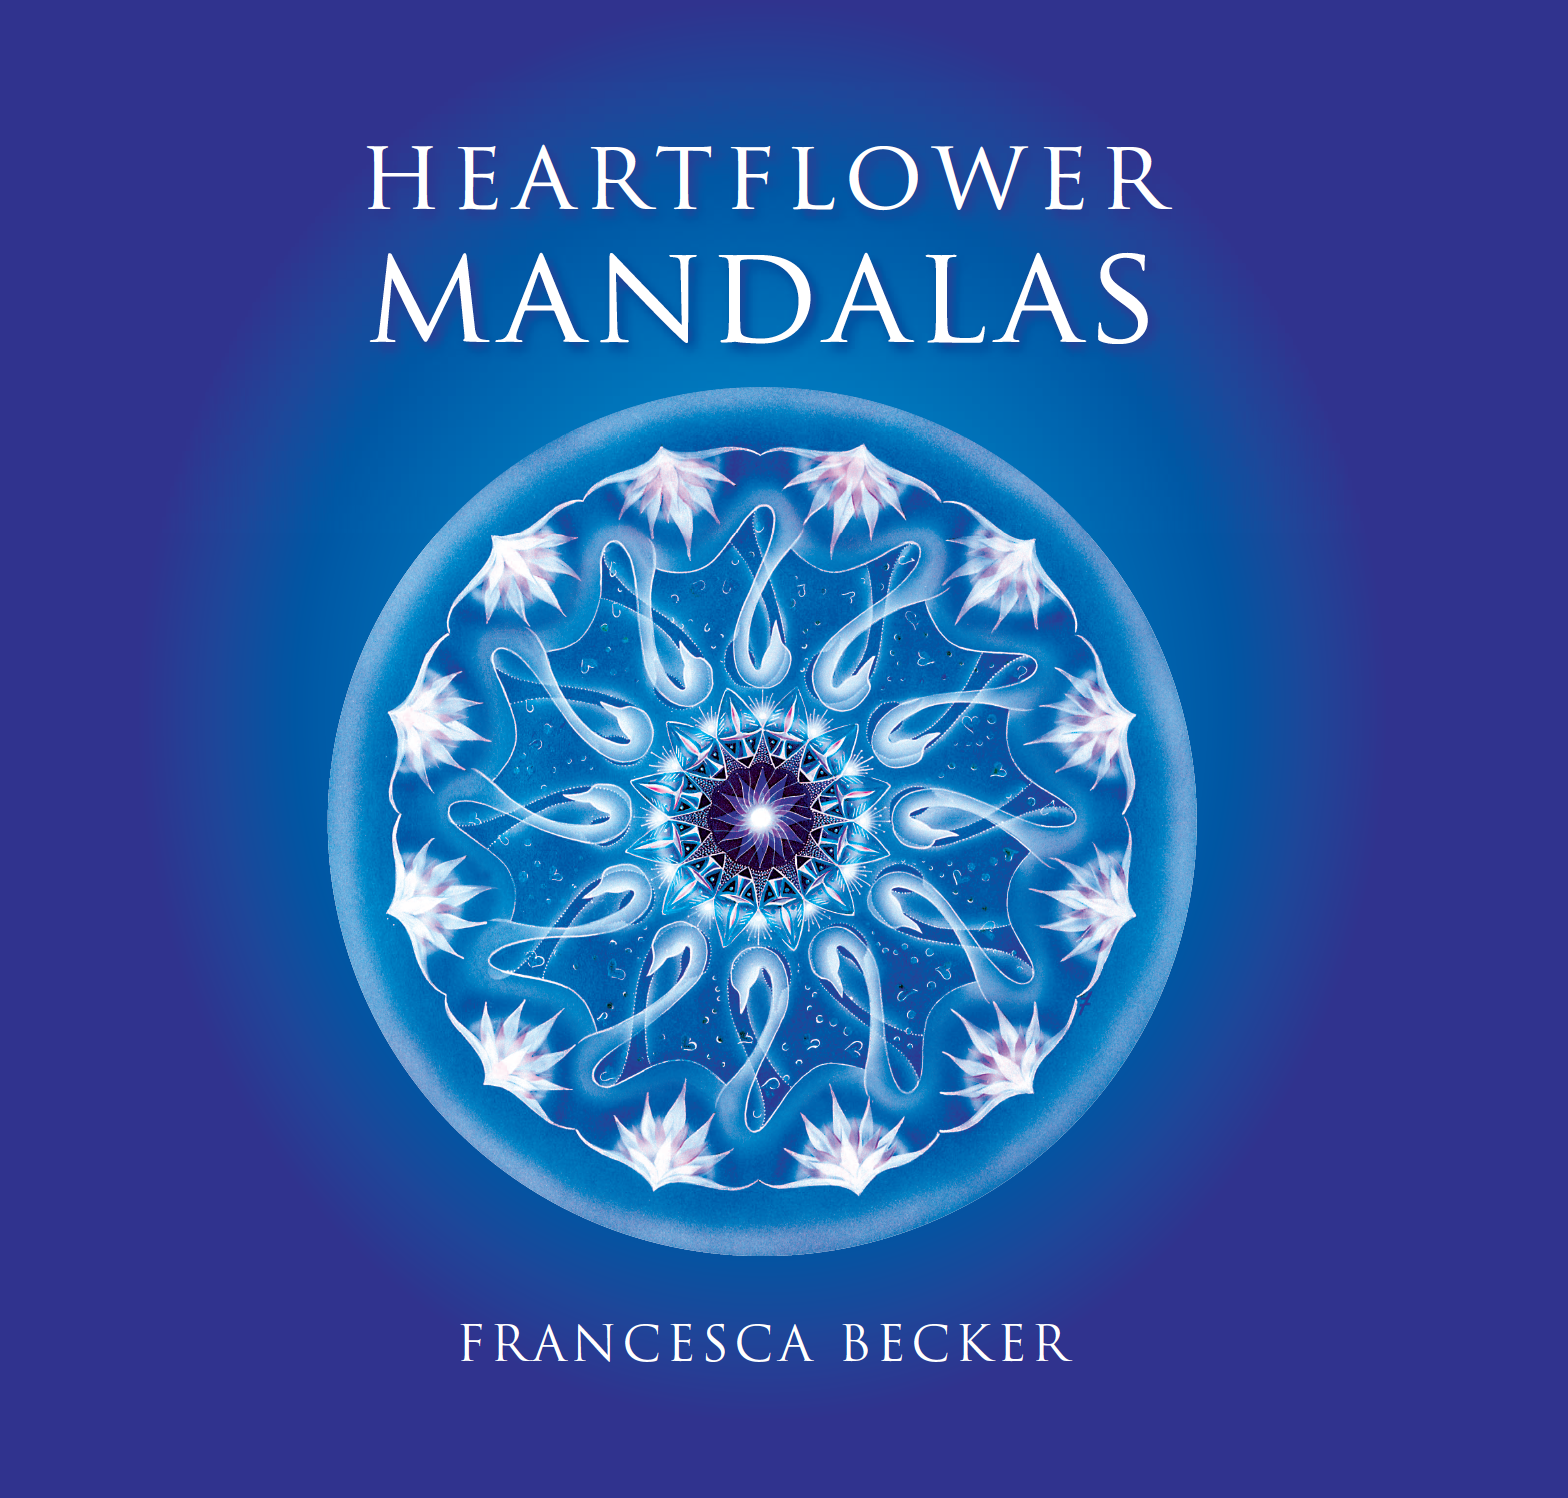 Heartflower Mandalas Book Cover